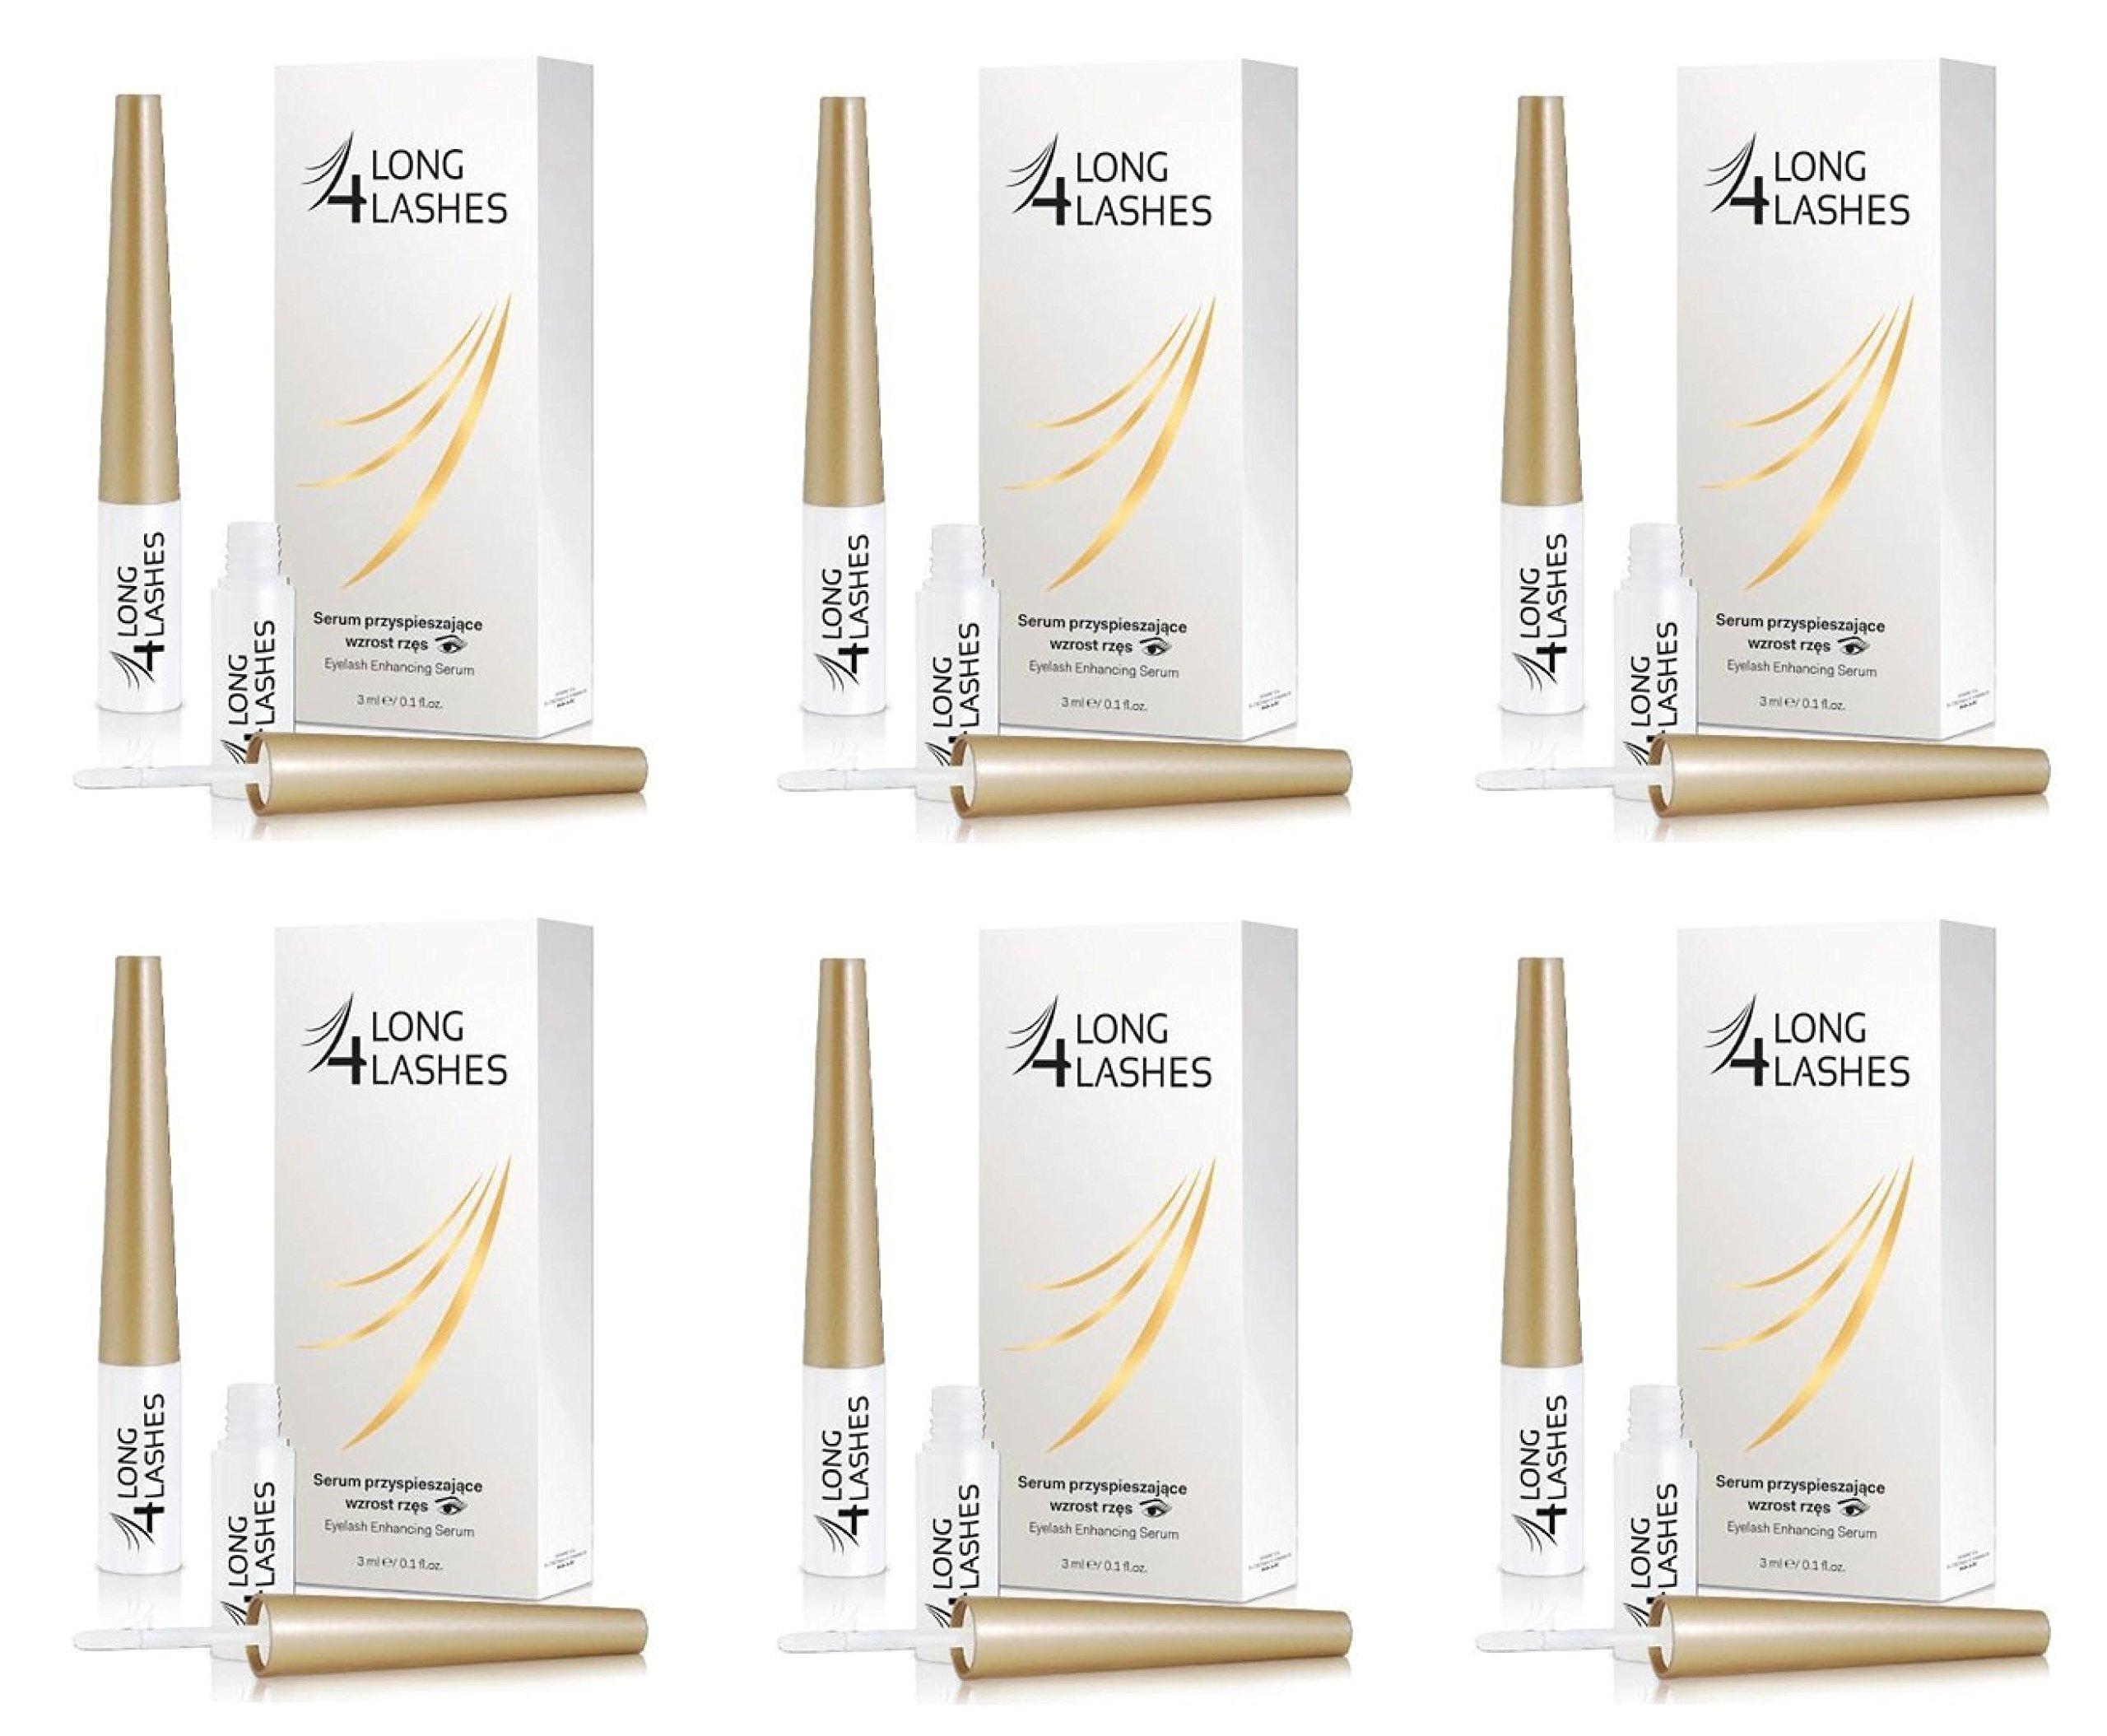 Long 4 Lashes by Oceanic Eyelash Enhancing Serum, 3 ml (Pack of 6)